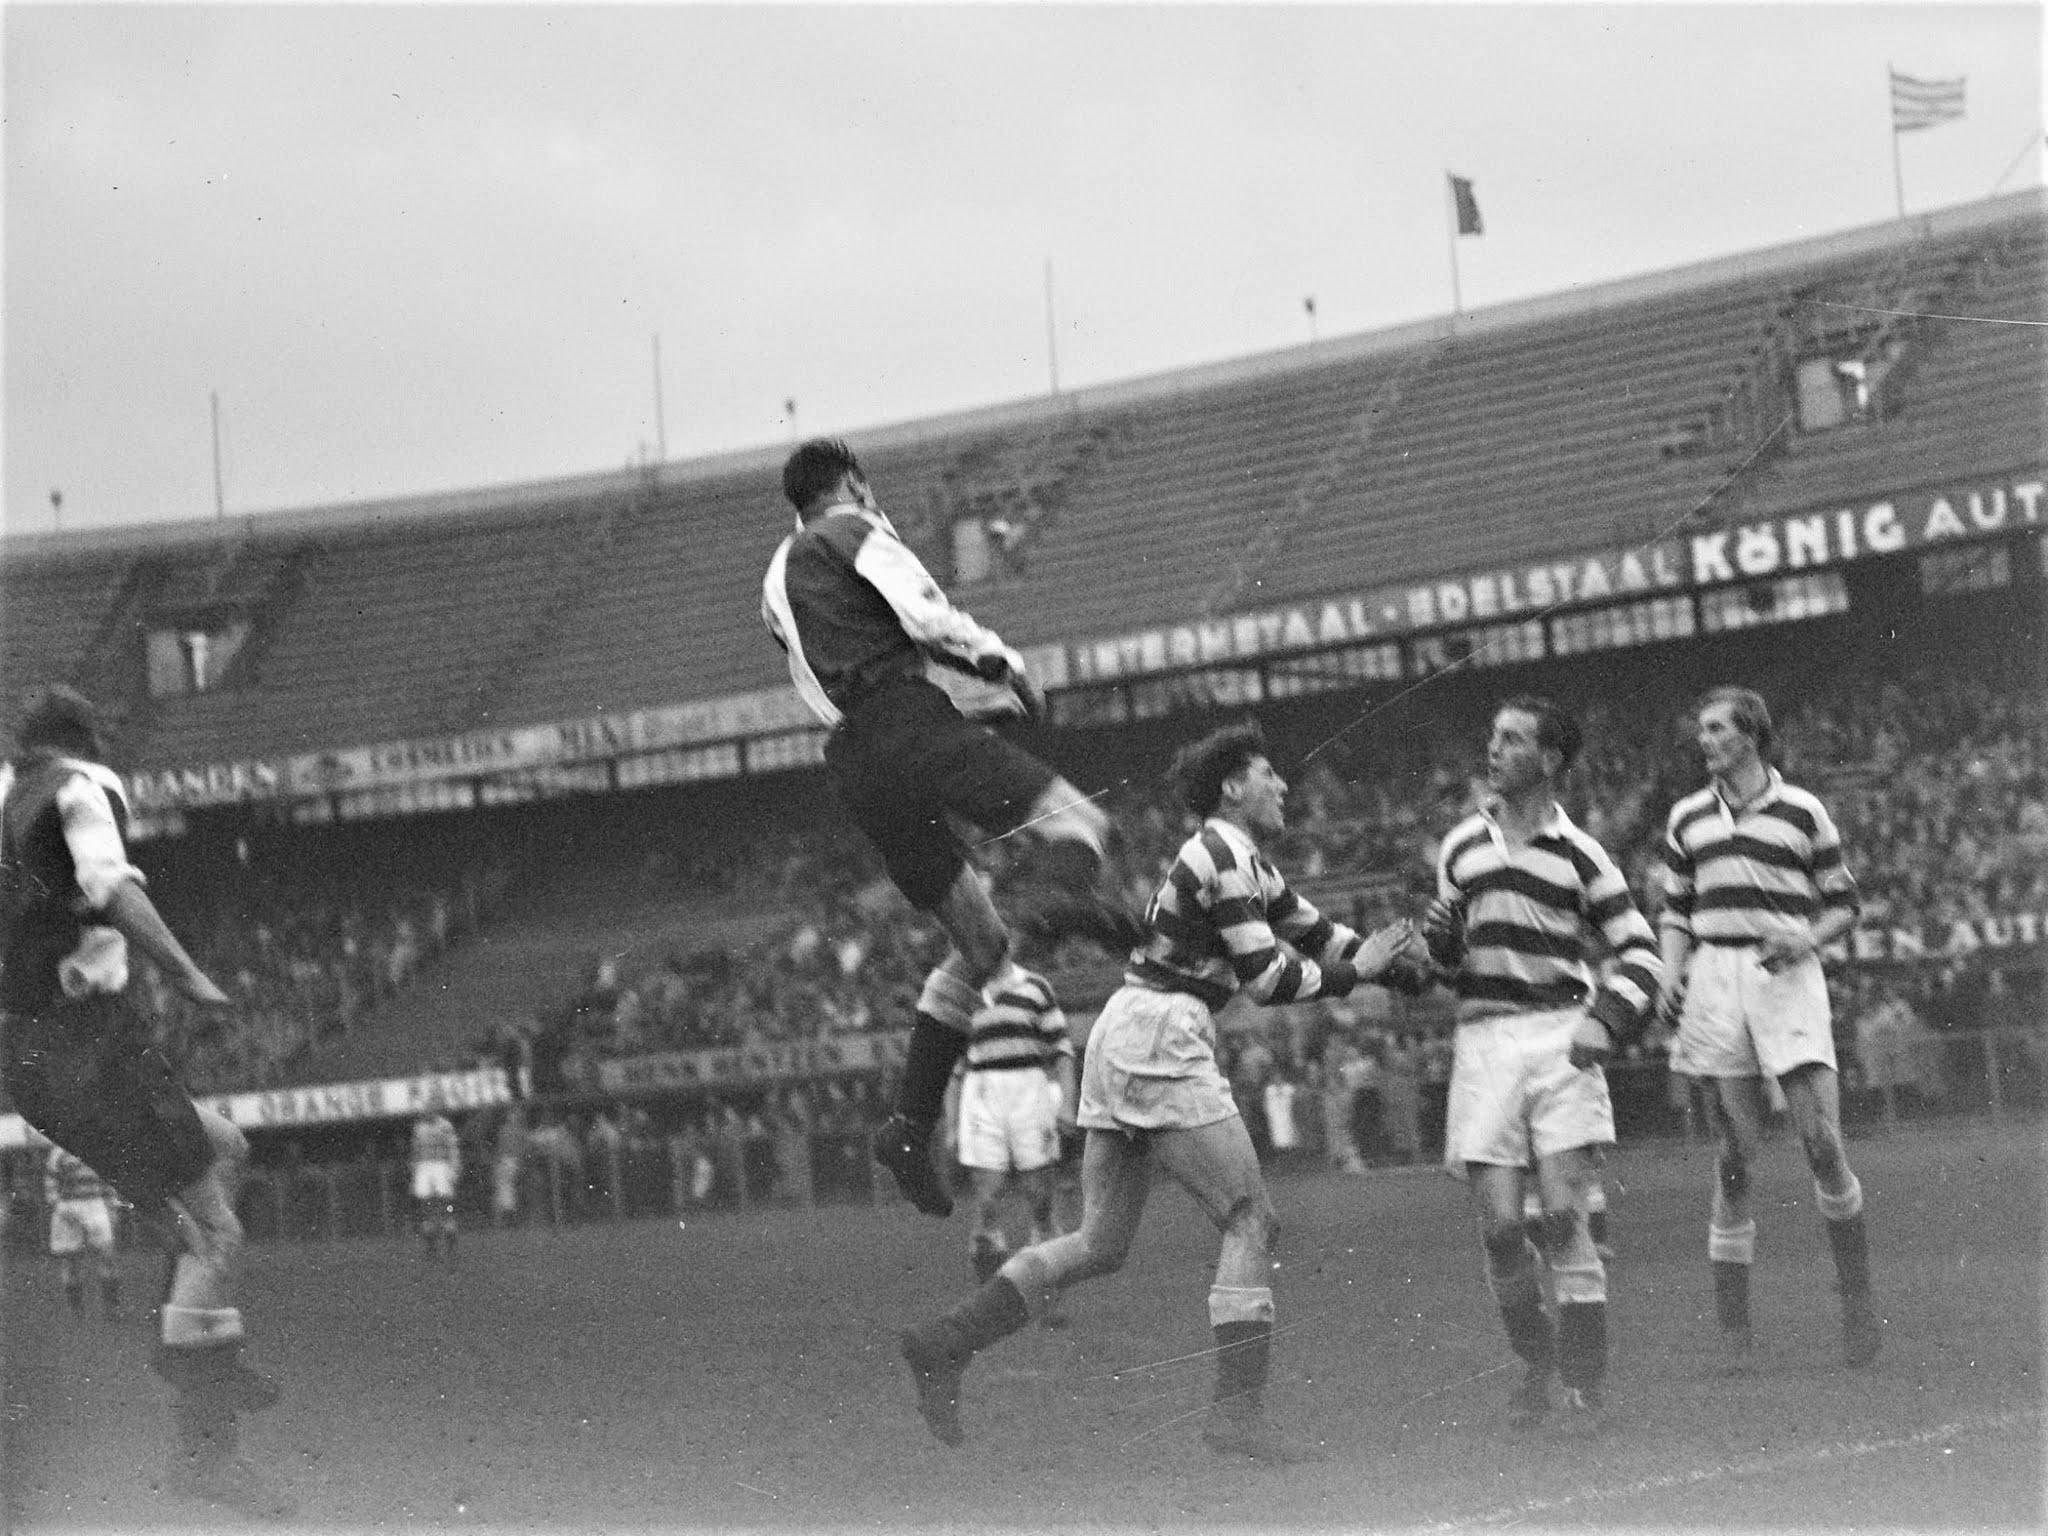 Feyenoord-verdediger Joop Smulders heerst in de lucht